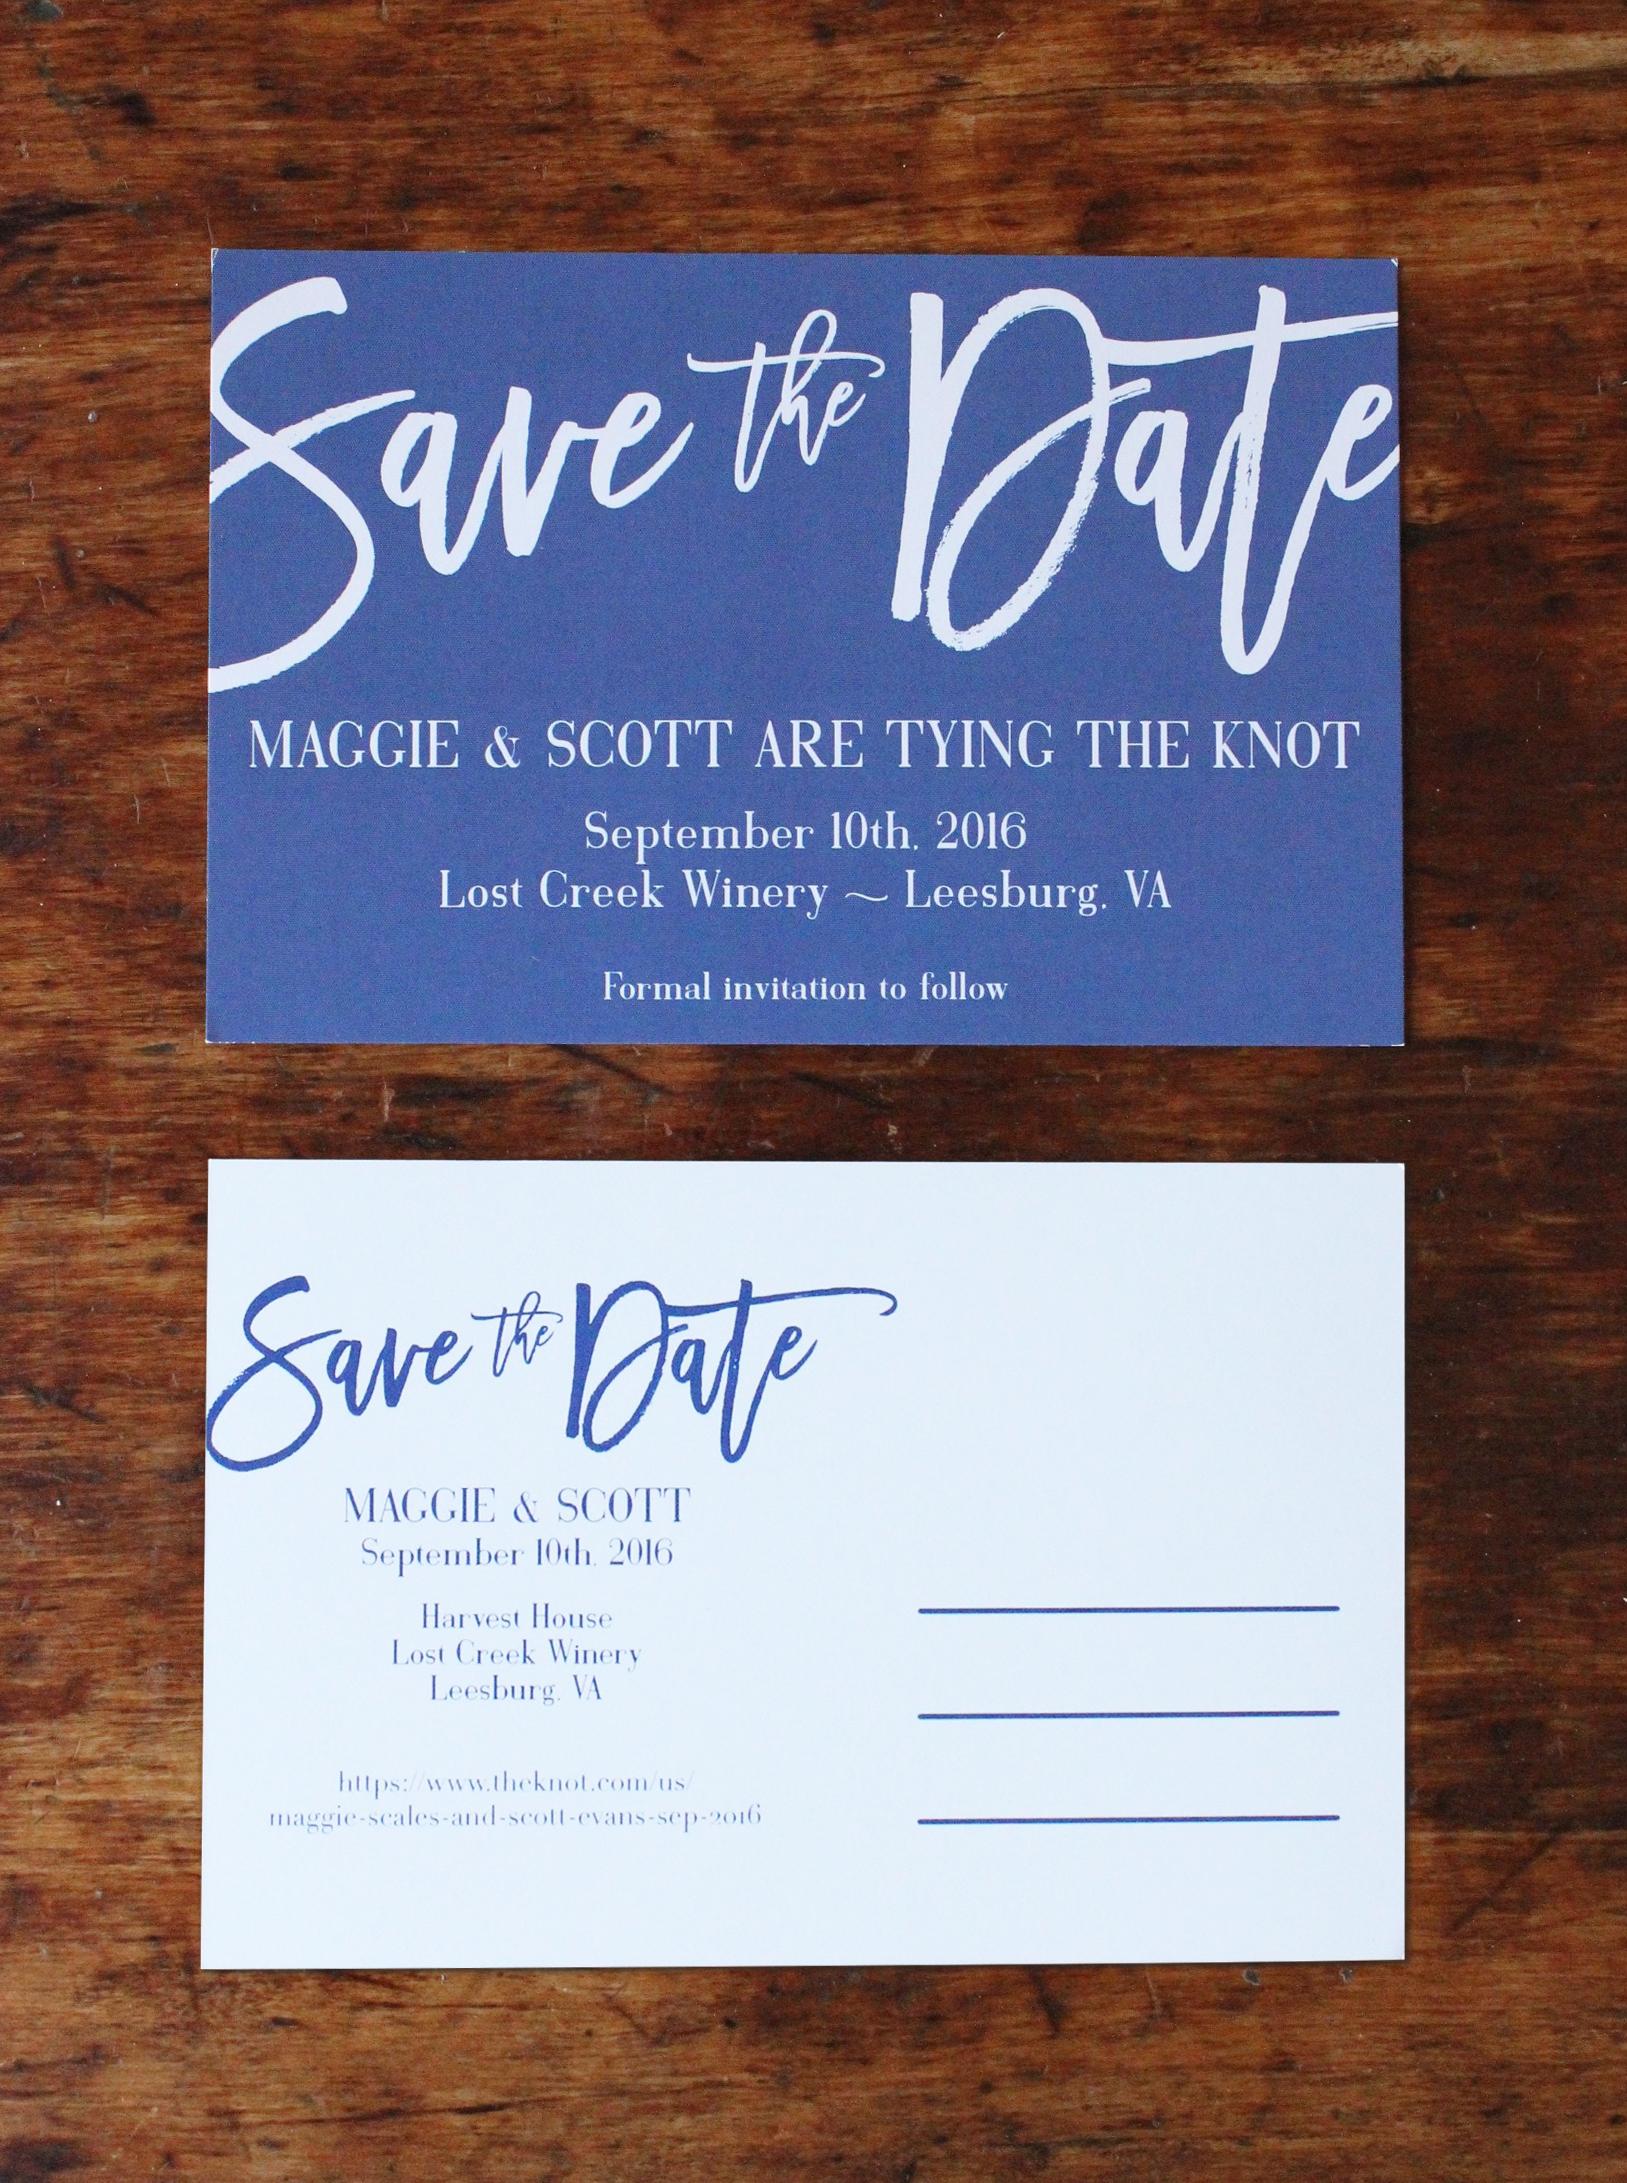 maggie & scott   save the date postcard